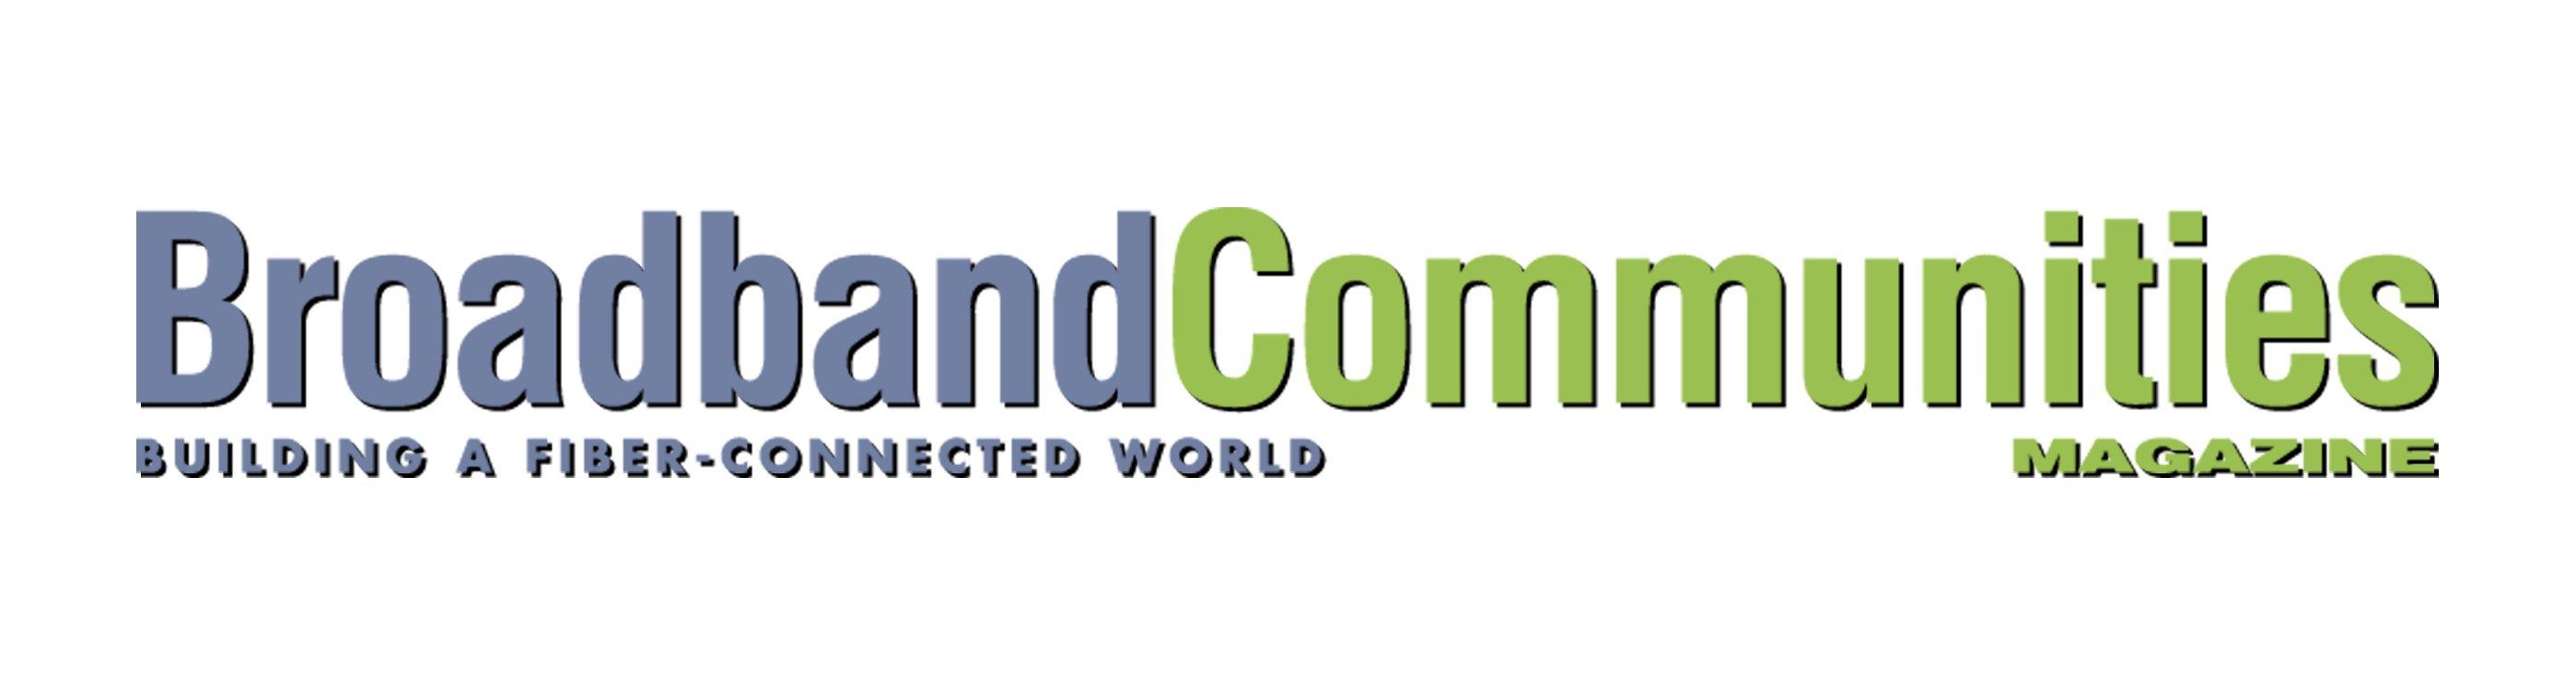 Broadband Communities (logo) (blog image)